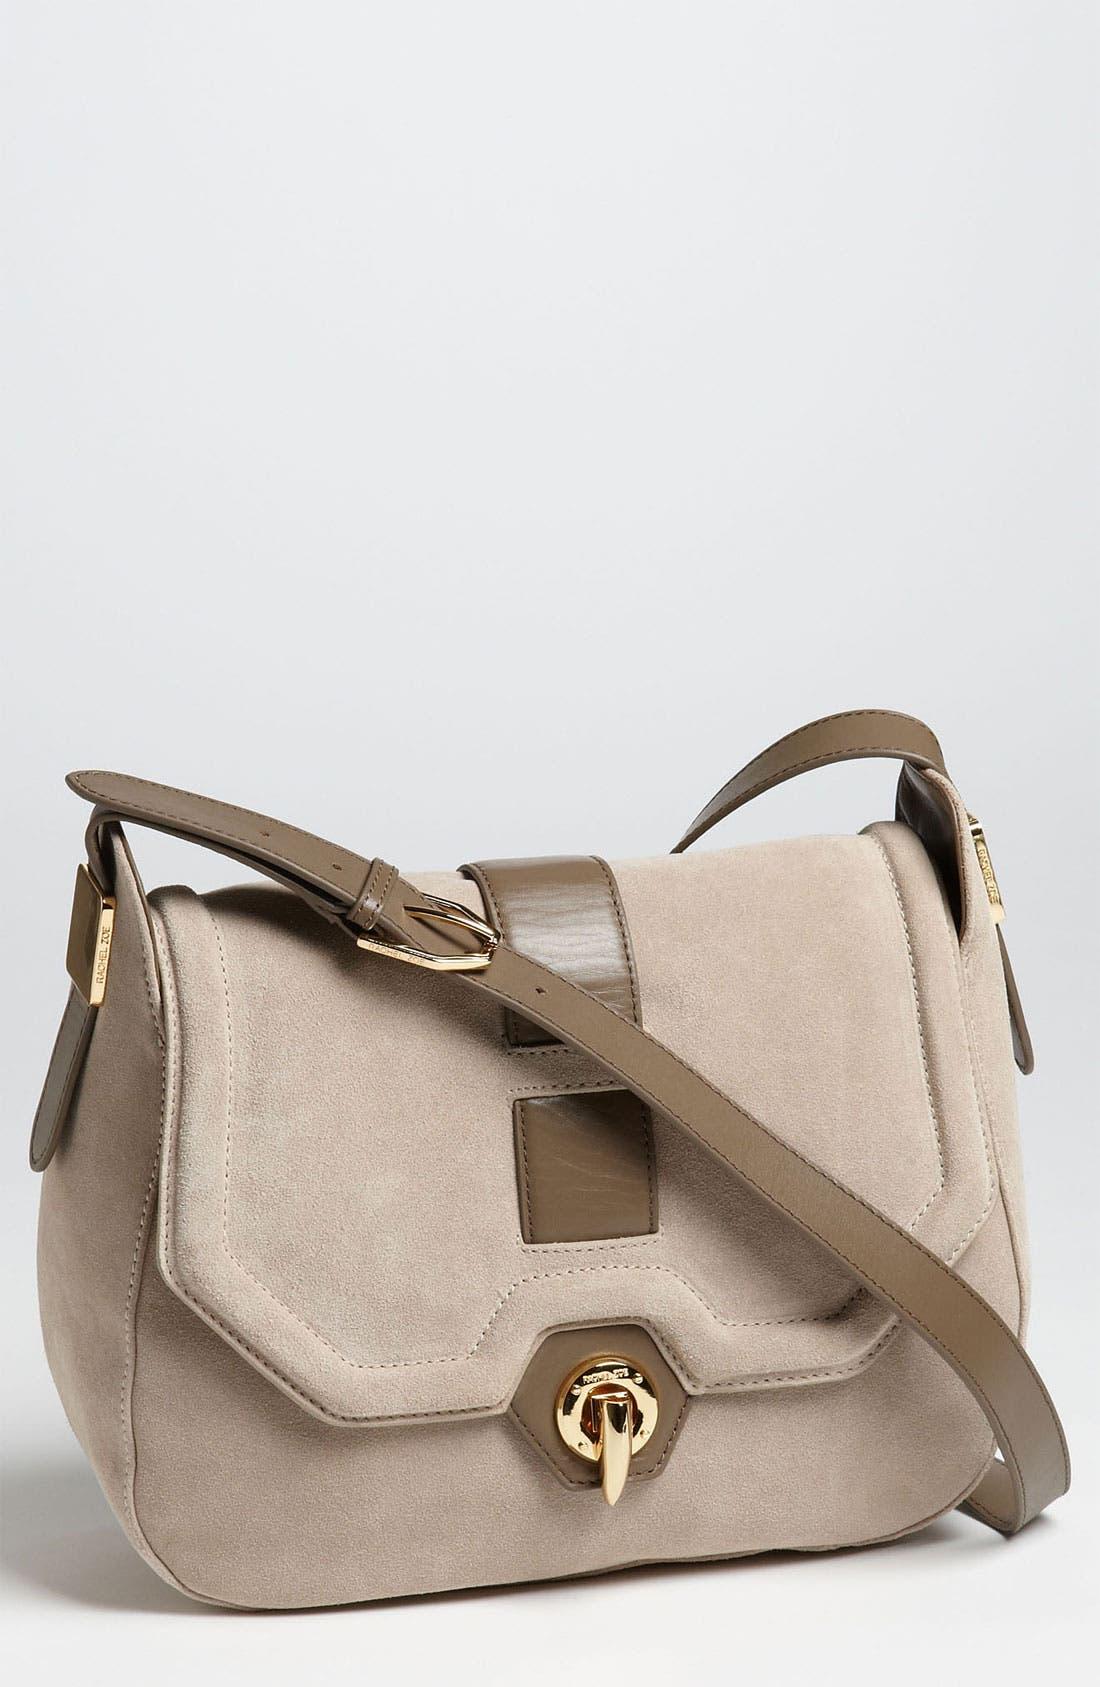 Alternate Image 1 Selected - Rachel Zoe 'Eve - Large' Crossbody Bag